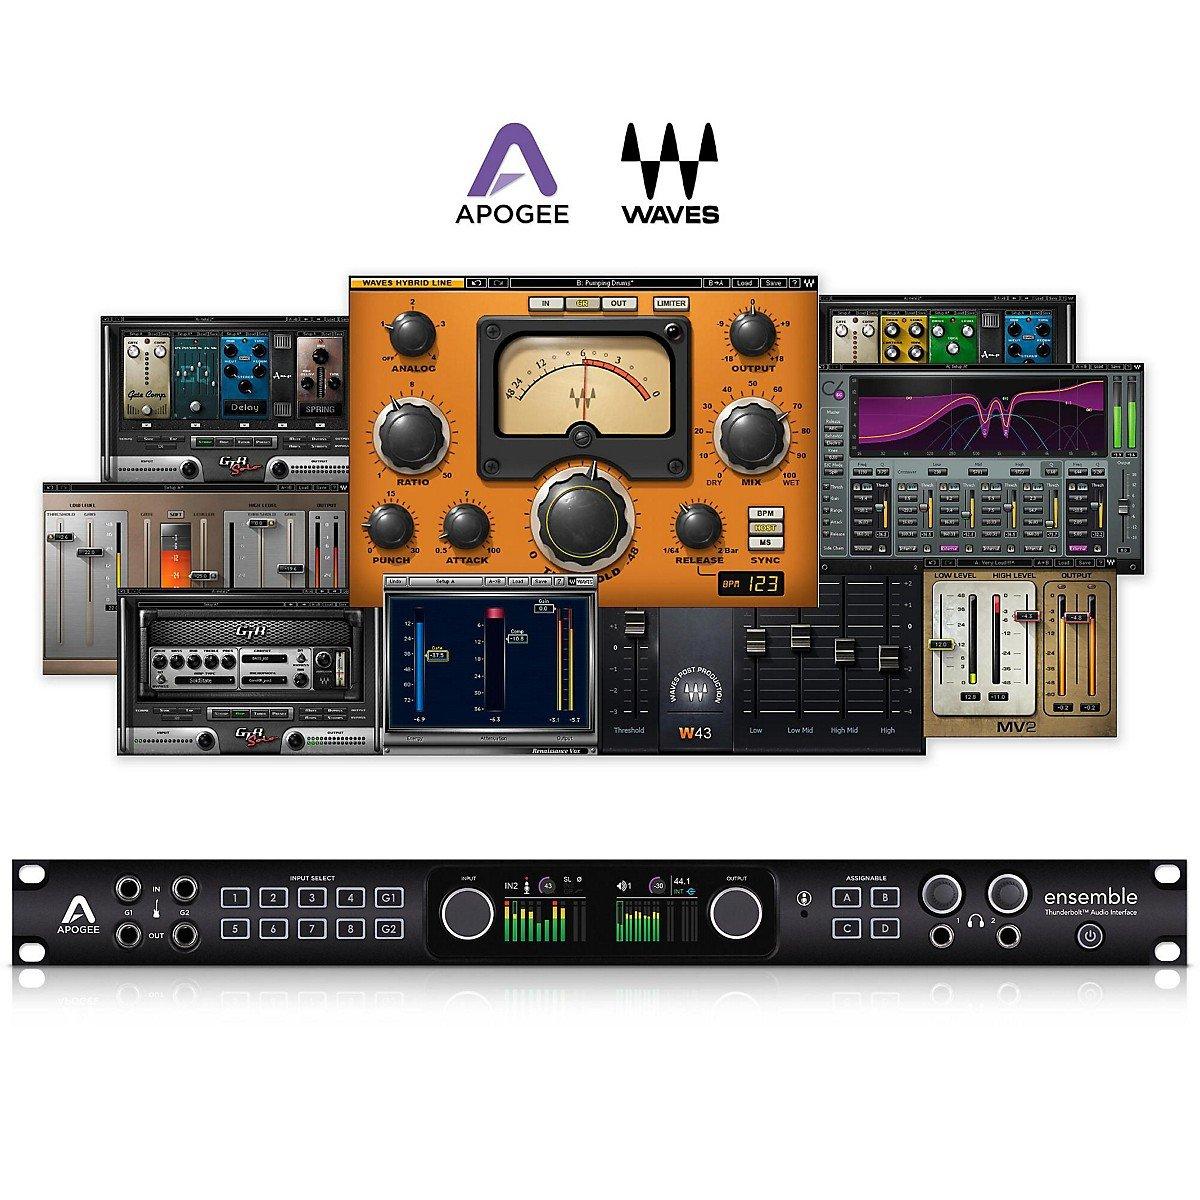 Apogee Ensemble Thunderbolt オーディオインターフェイス ENSEMBLETHUNDERBOLT 【正規輸入品】 B00O9VR75C